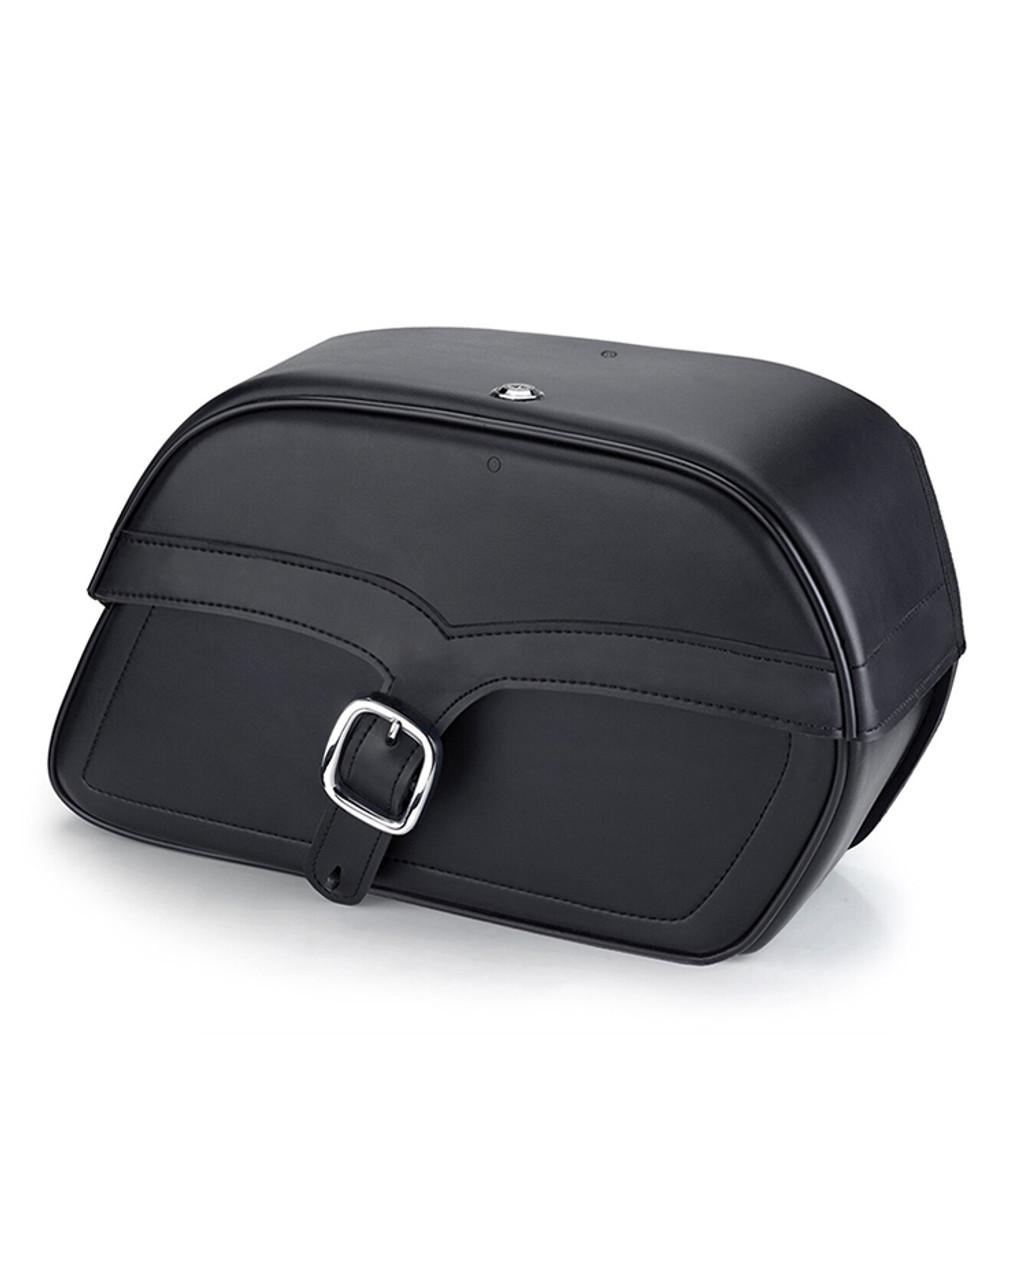 Honda VTX 1800 C Charger Single Strap Large Motorcycle Saddlebags Main Bag View